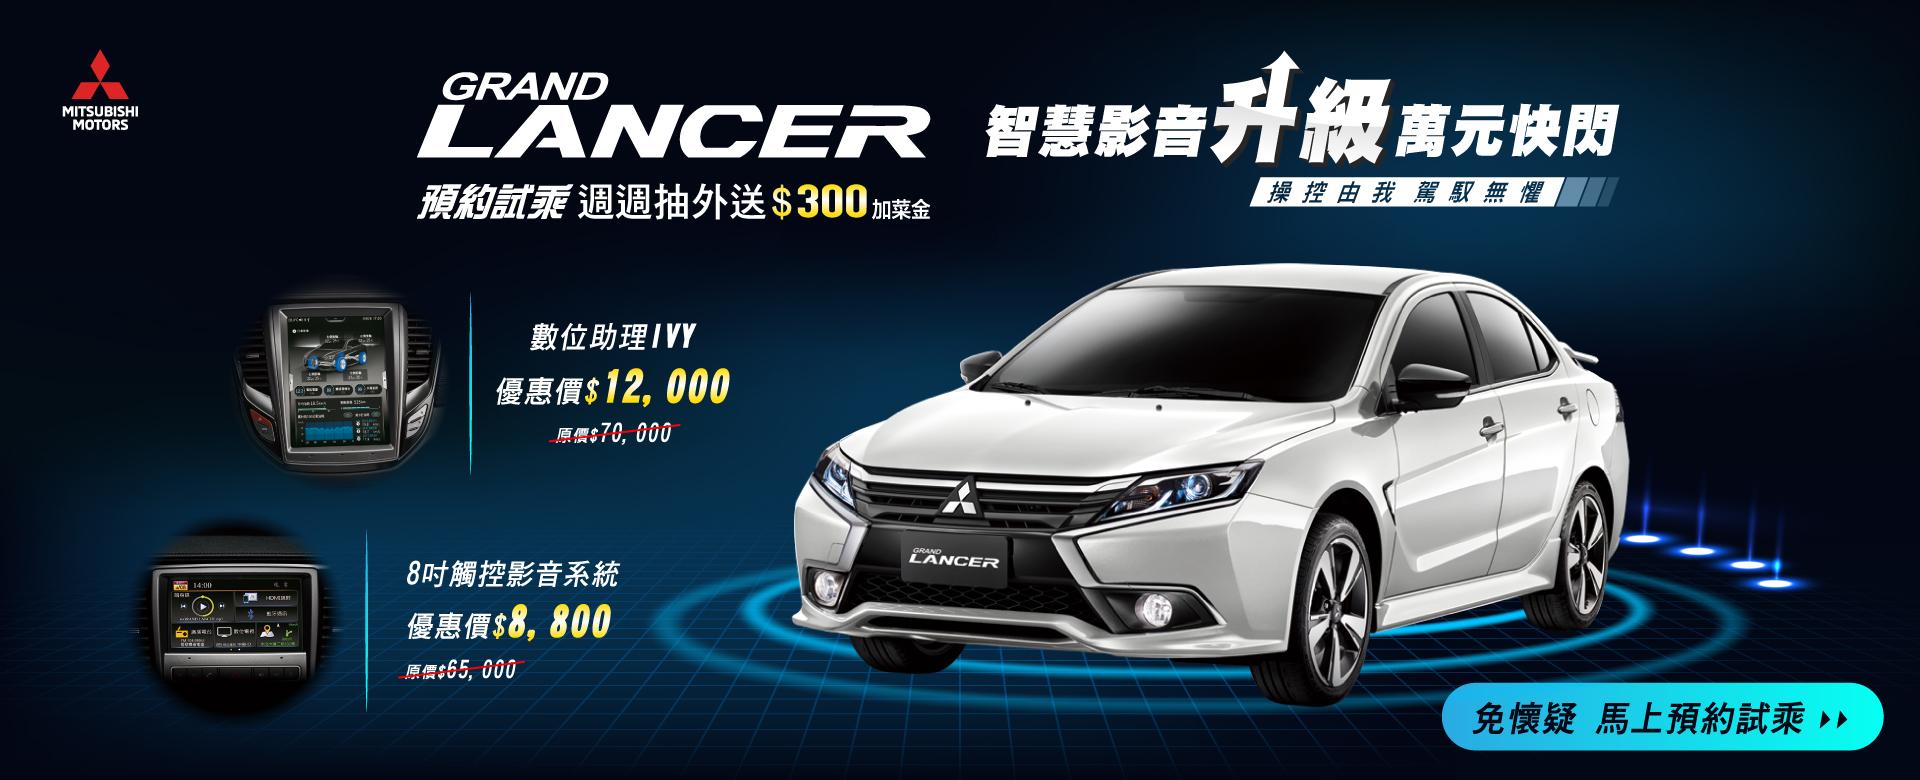 Mitsubishi Lancer 影音升級萬元快閃。